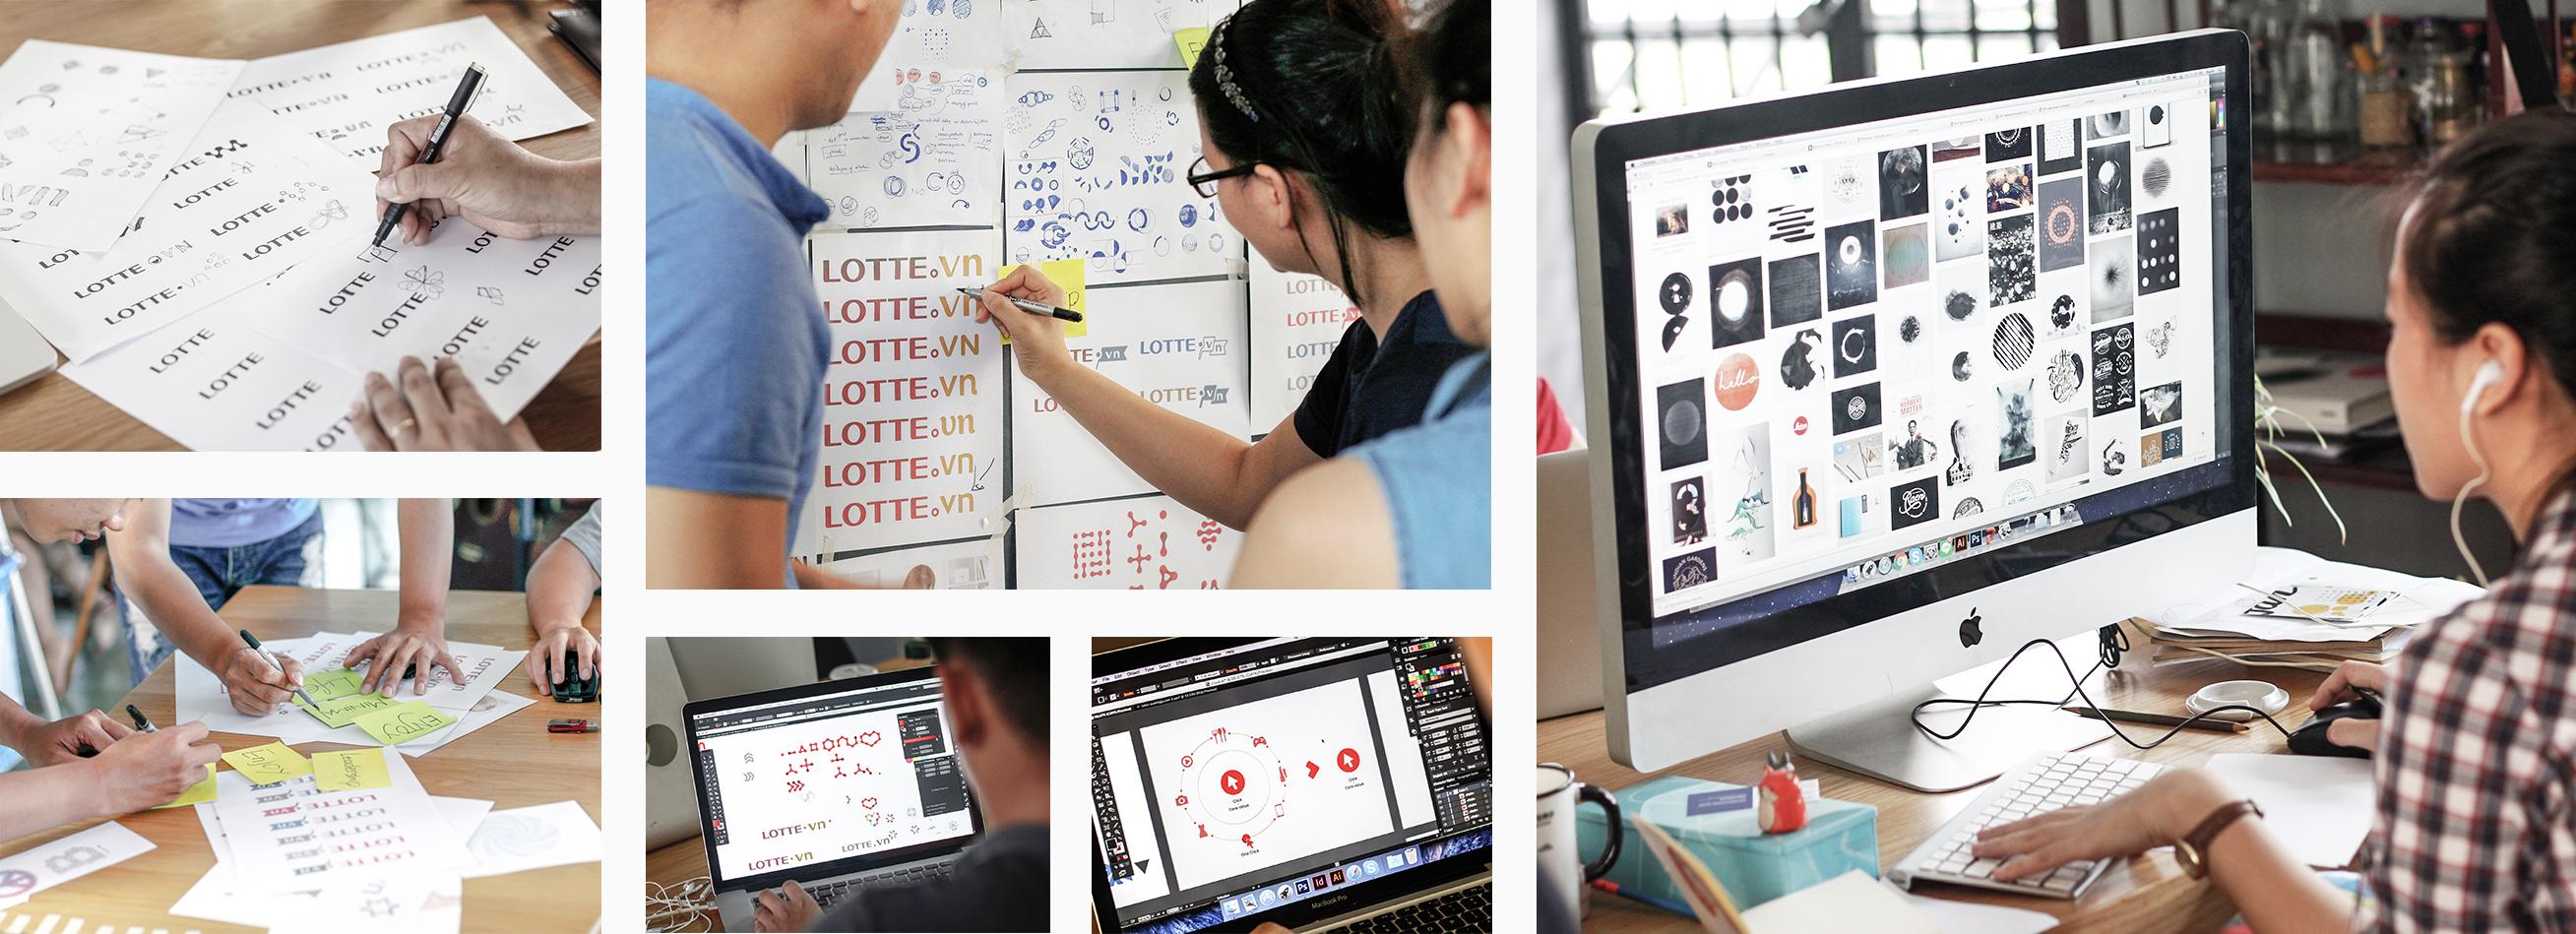 branding designprocess